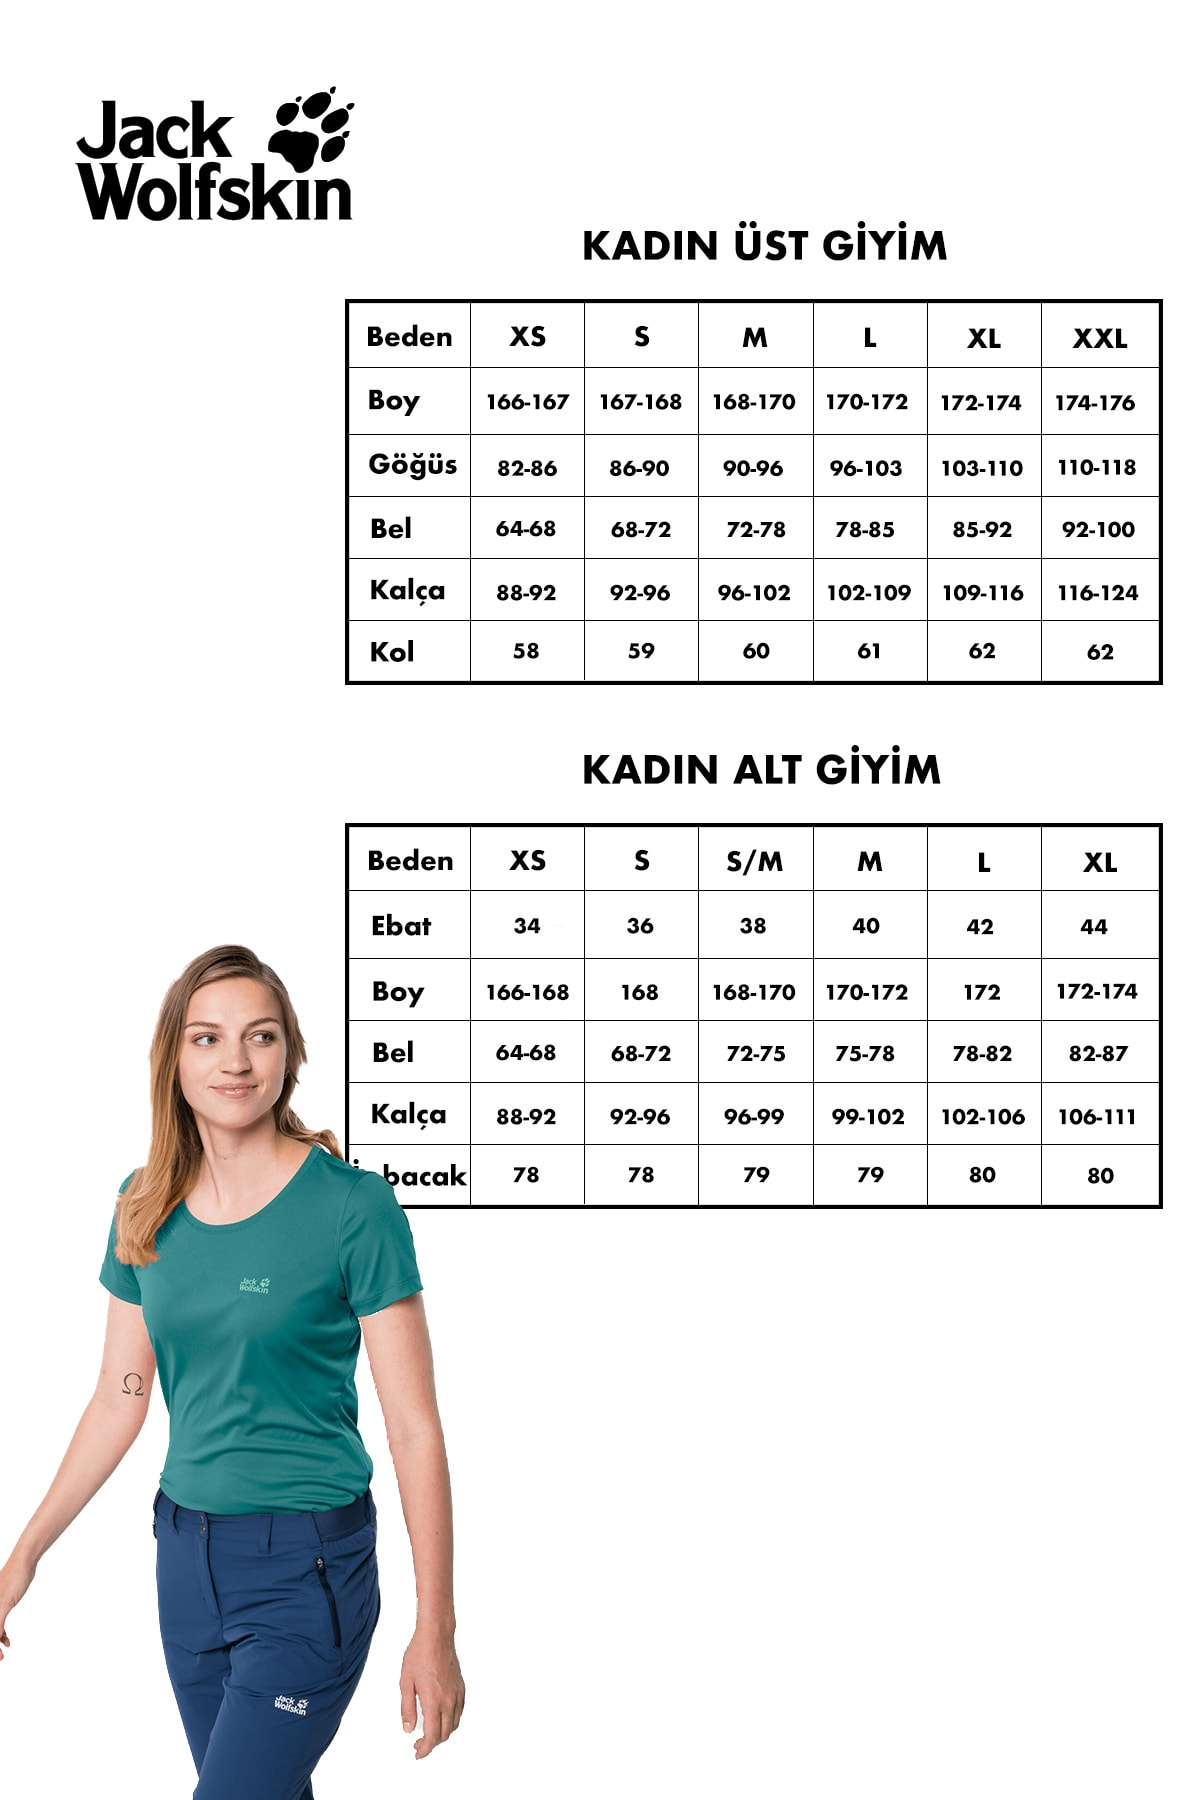 Jack Wolfskin Rock Chill Logo Kadın T-shirt - 1805541-1098 2